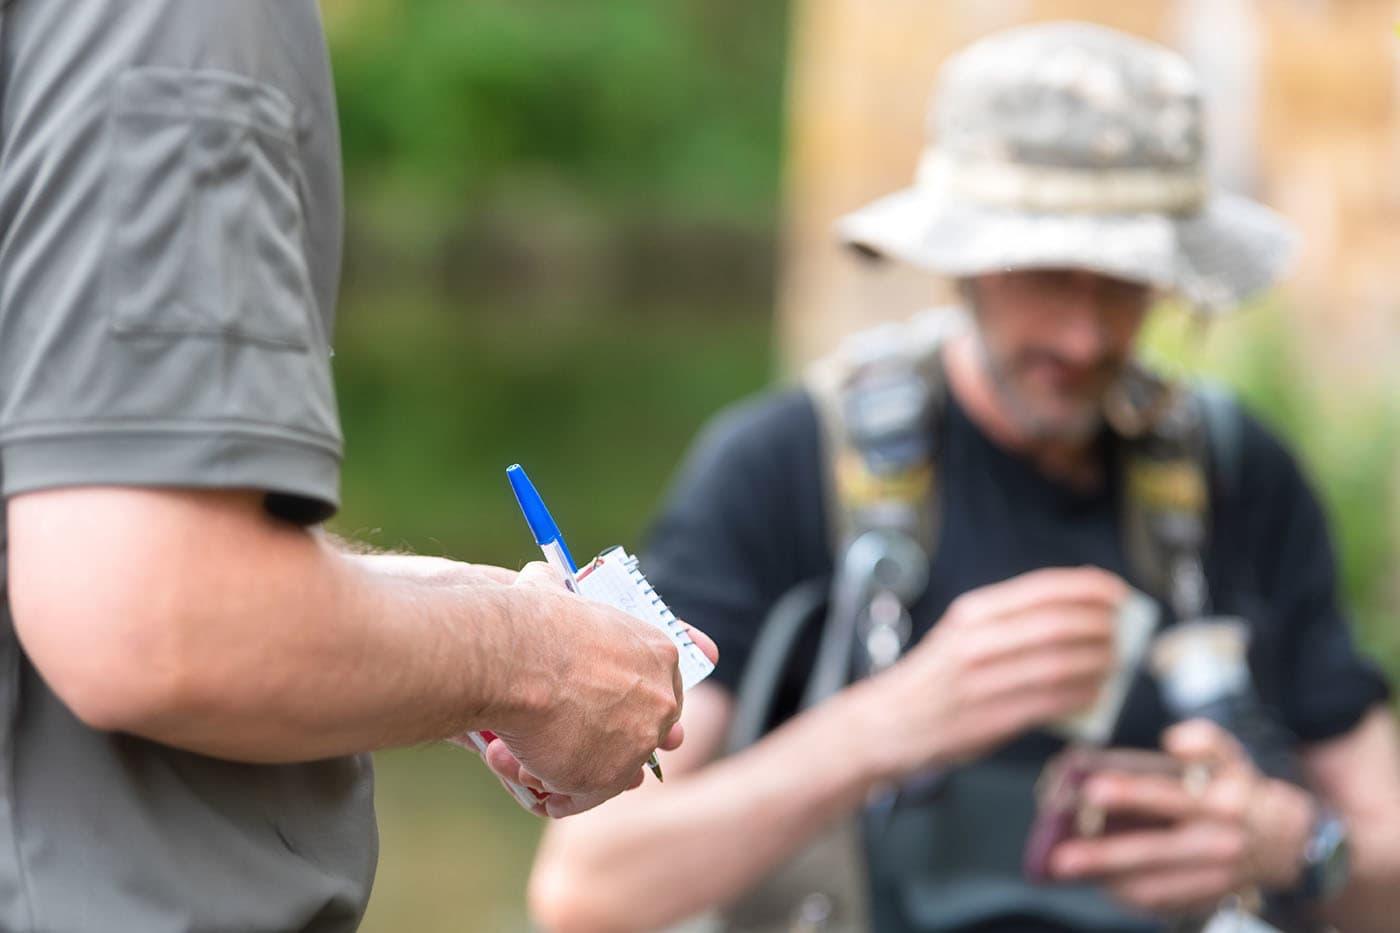 Hero Image Conservation Officer: Career Guide